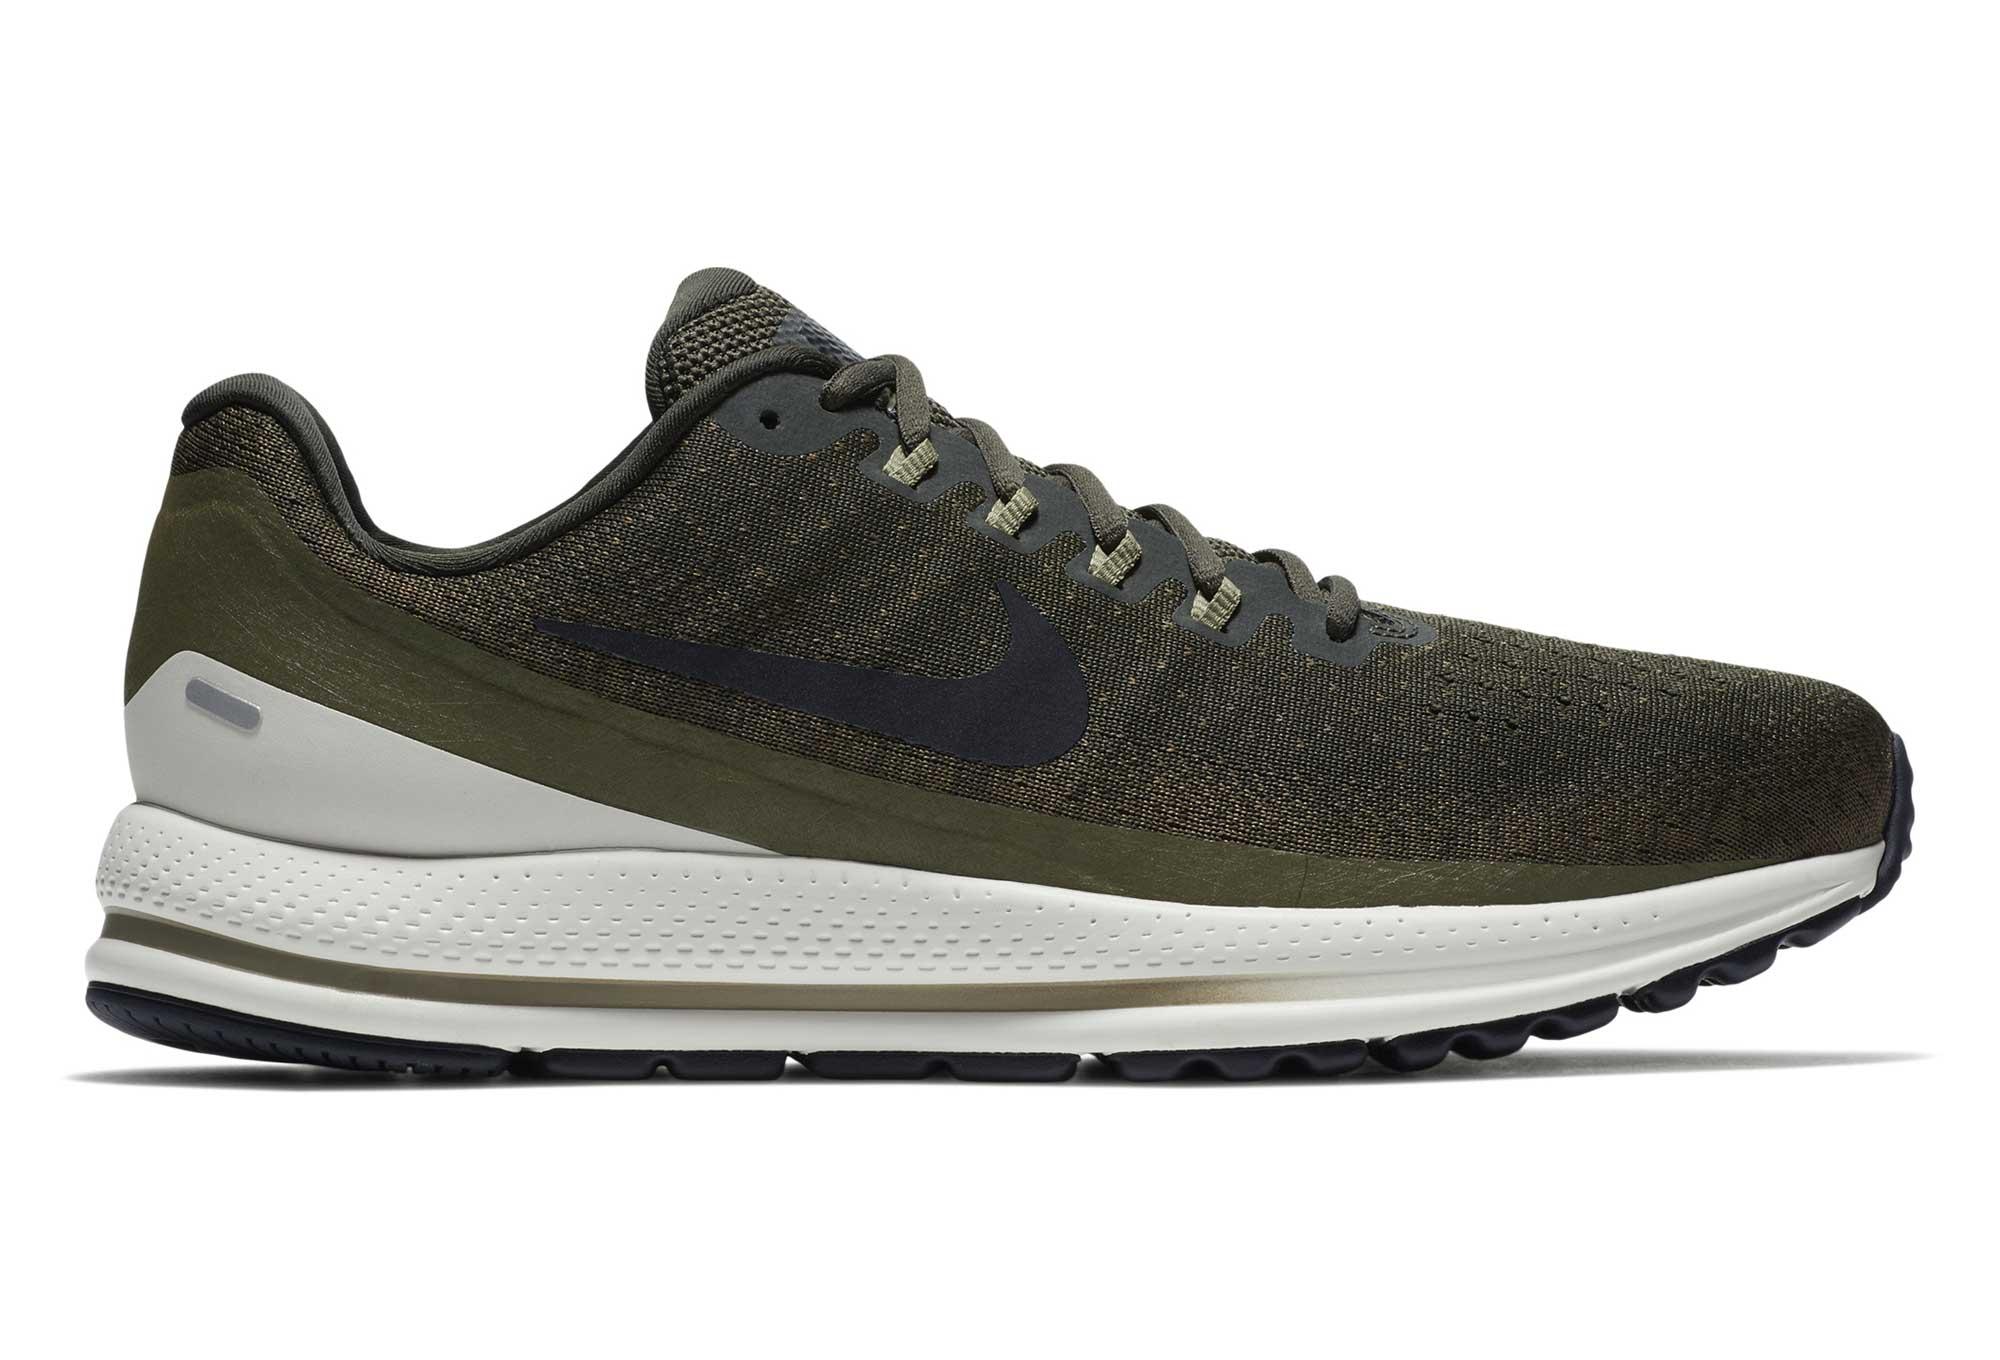 Vert Vomero Air Zoom 13 Nike Running Kaki De Chaussures qt0XPP